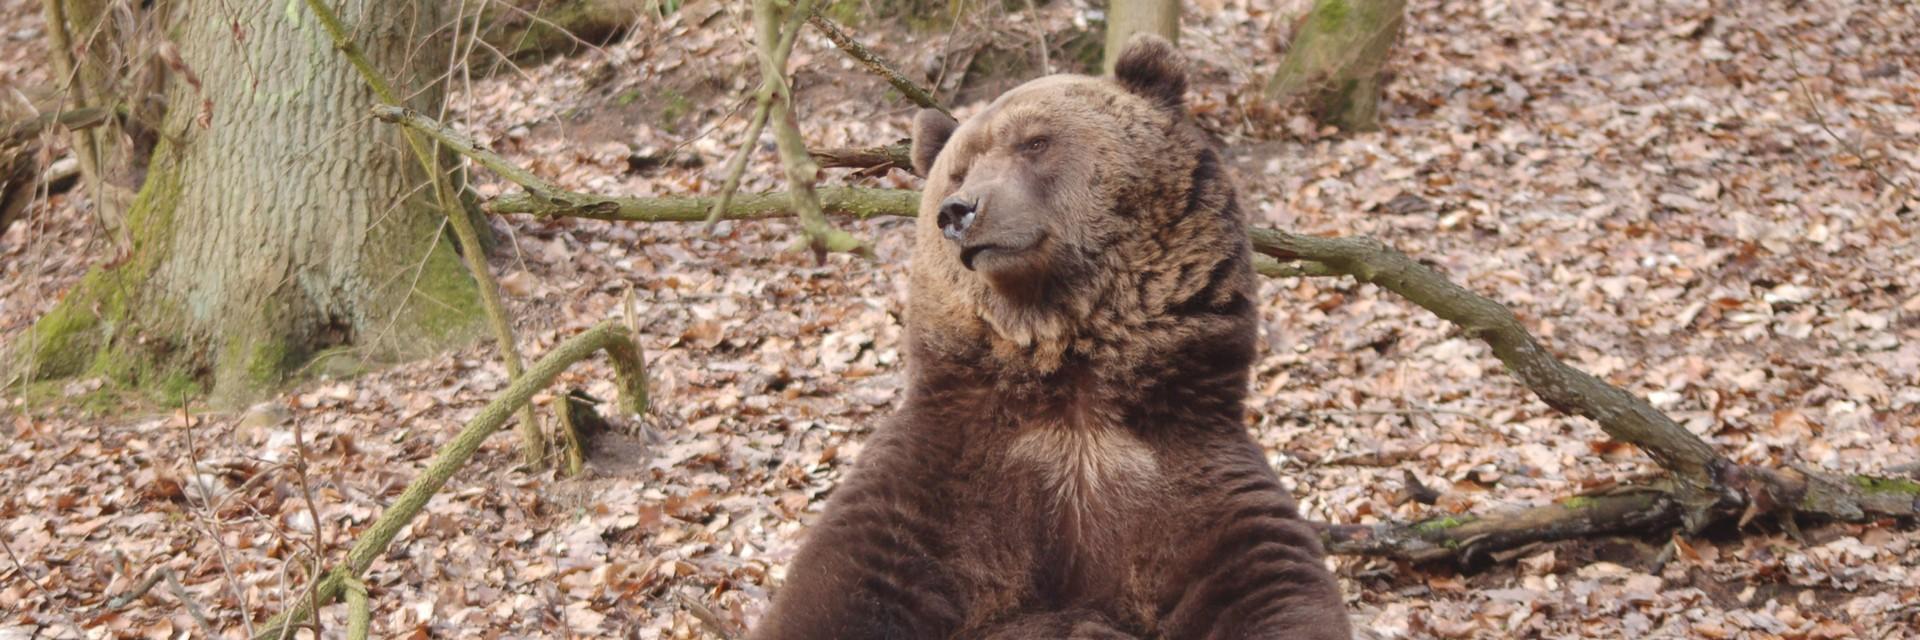 Braunbären im BÄRENWALD Müritz